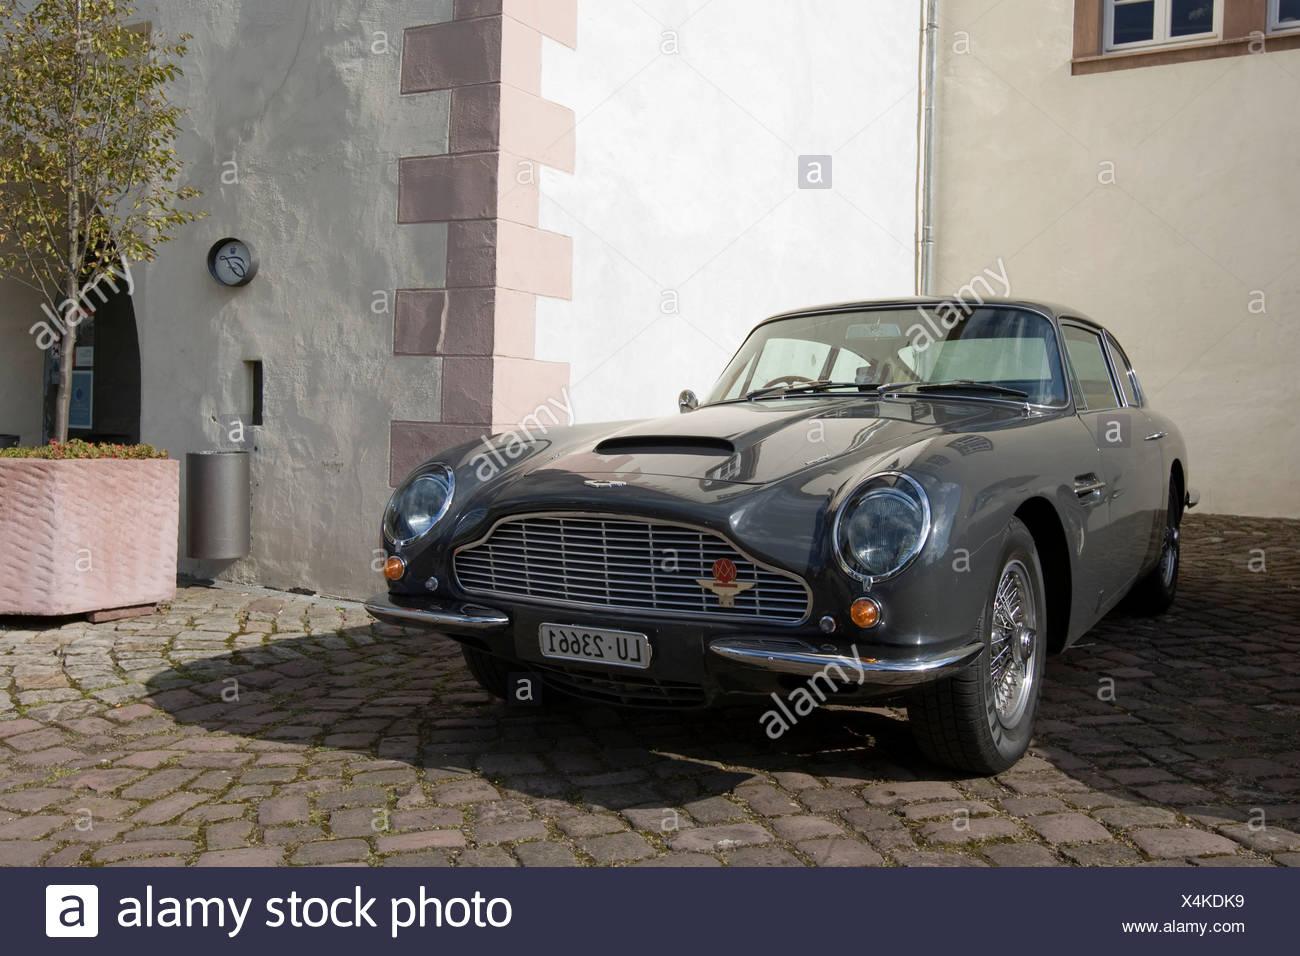 Aston Martin DB6, Aston Martin Meet, Lower Saxony, Germany, Europe - Stock Image